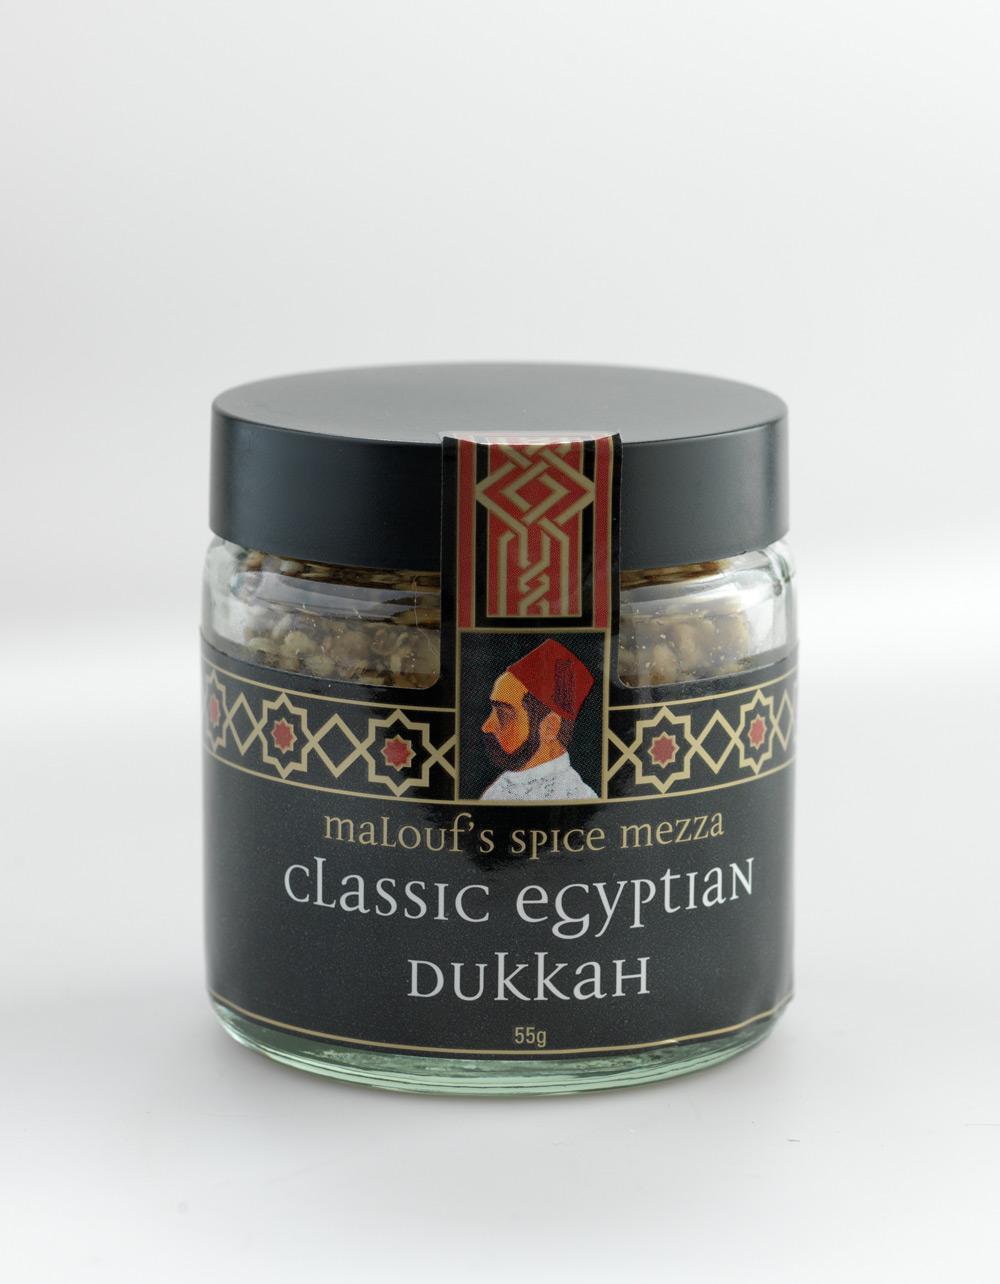 Malouf's Spice Mezza Classic Egyptian Dukkah 55g